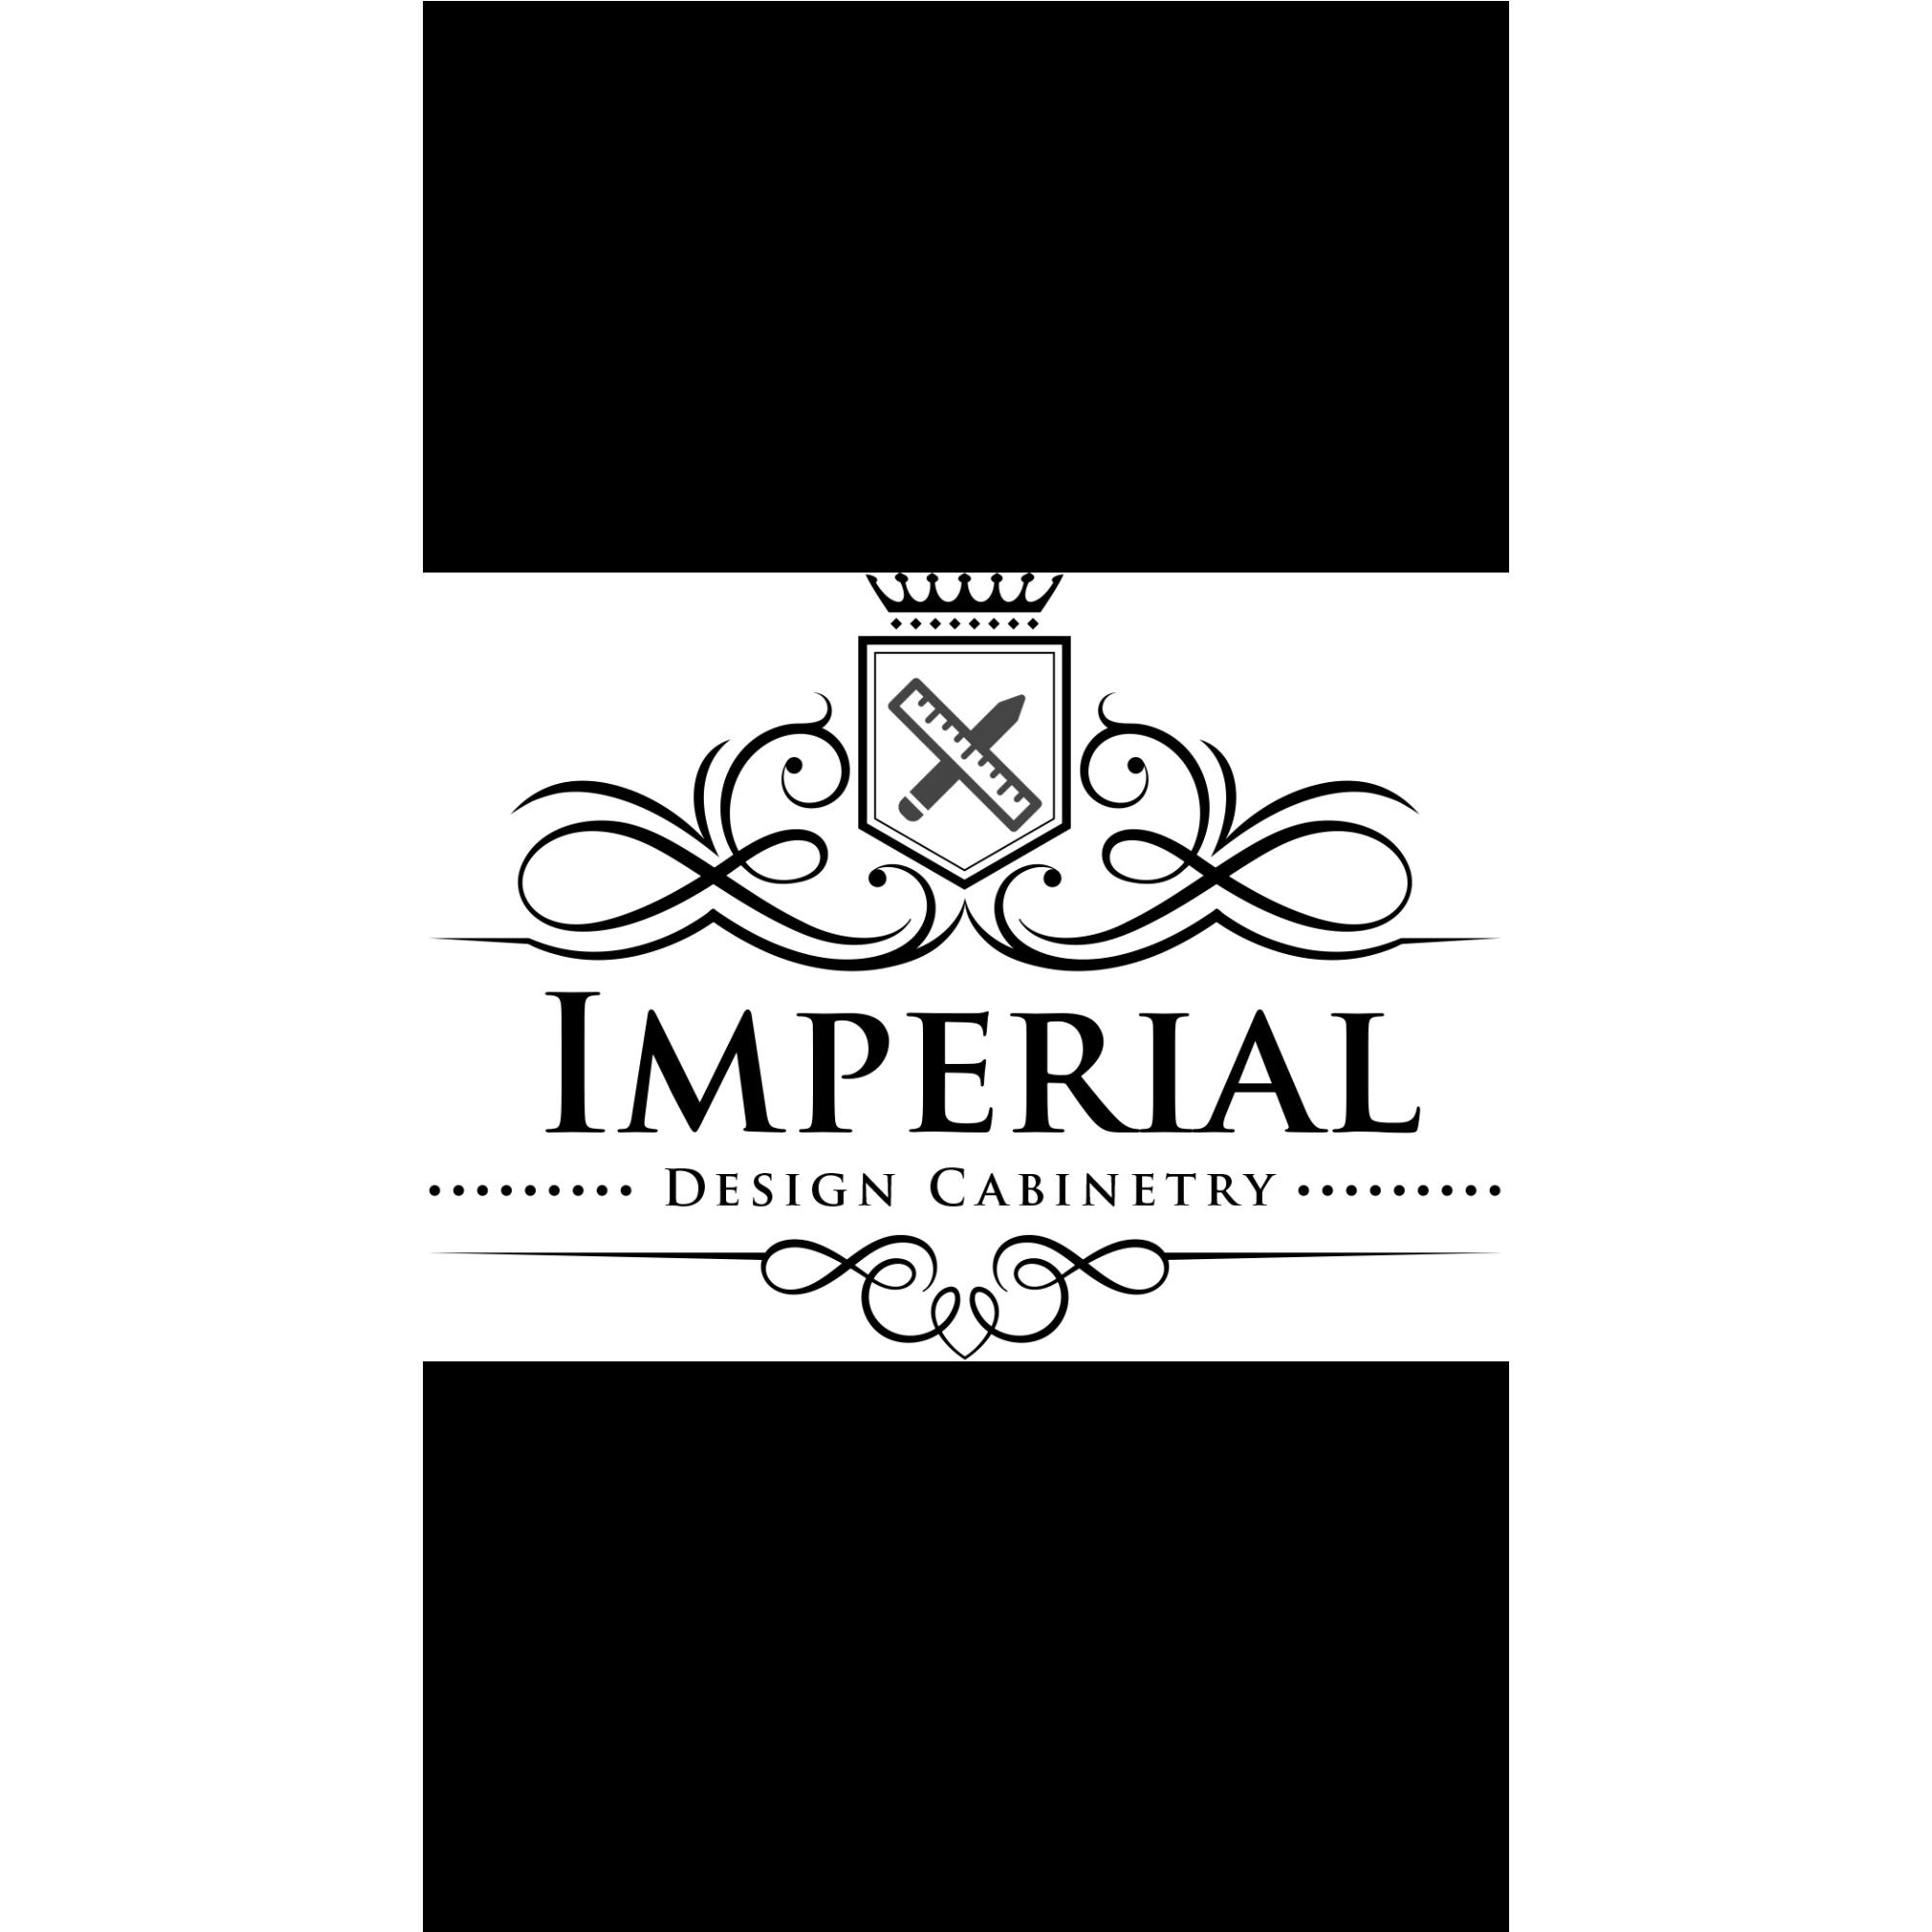 Imperial Design Cabinetry LLC - Norcross, GA 30071 - (404)625-2831   ShowMeLocal.com